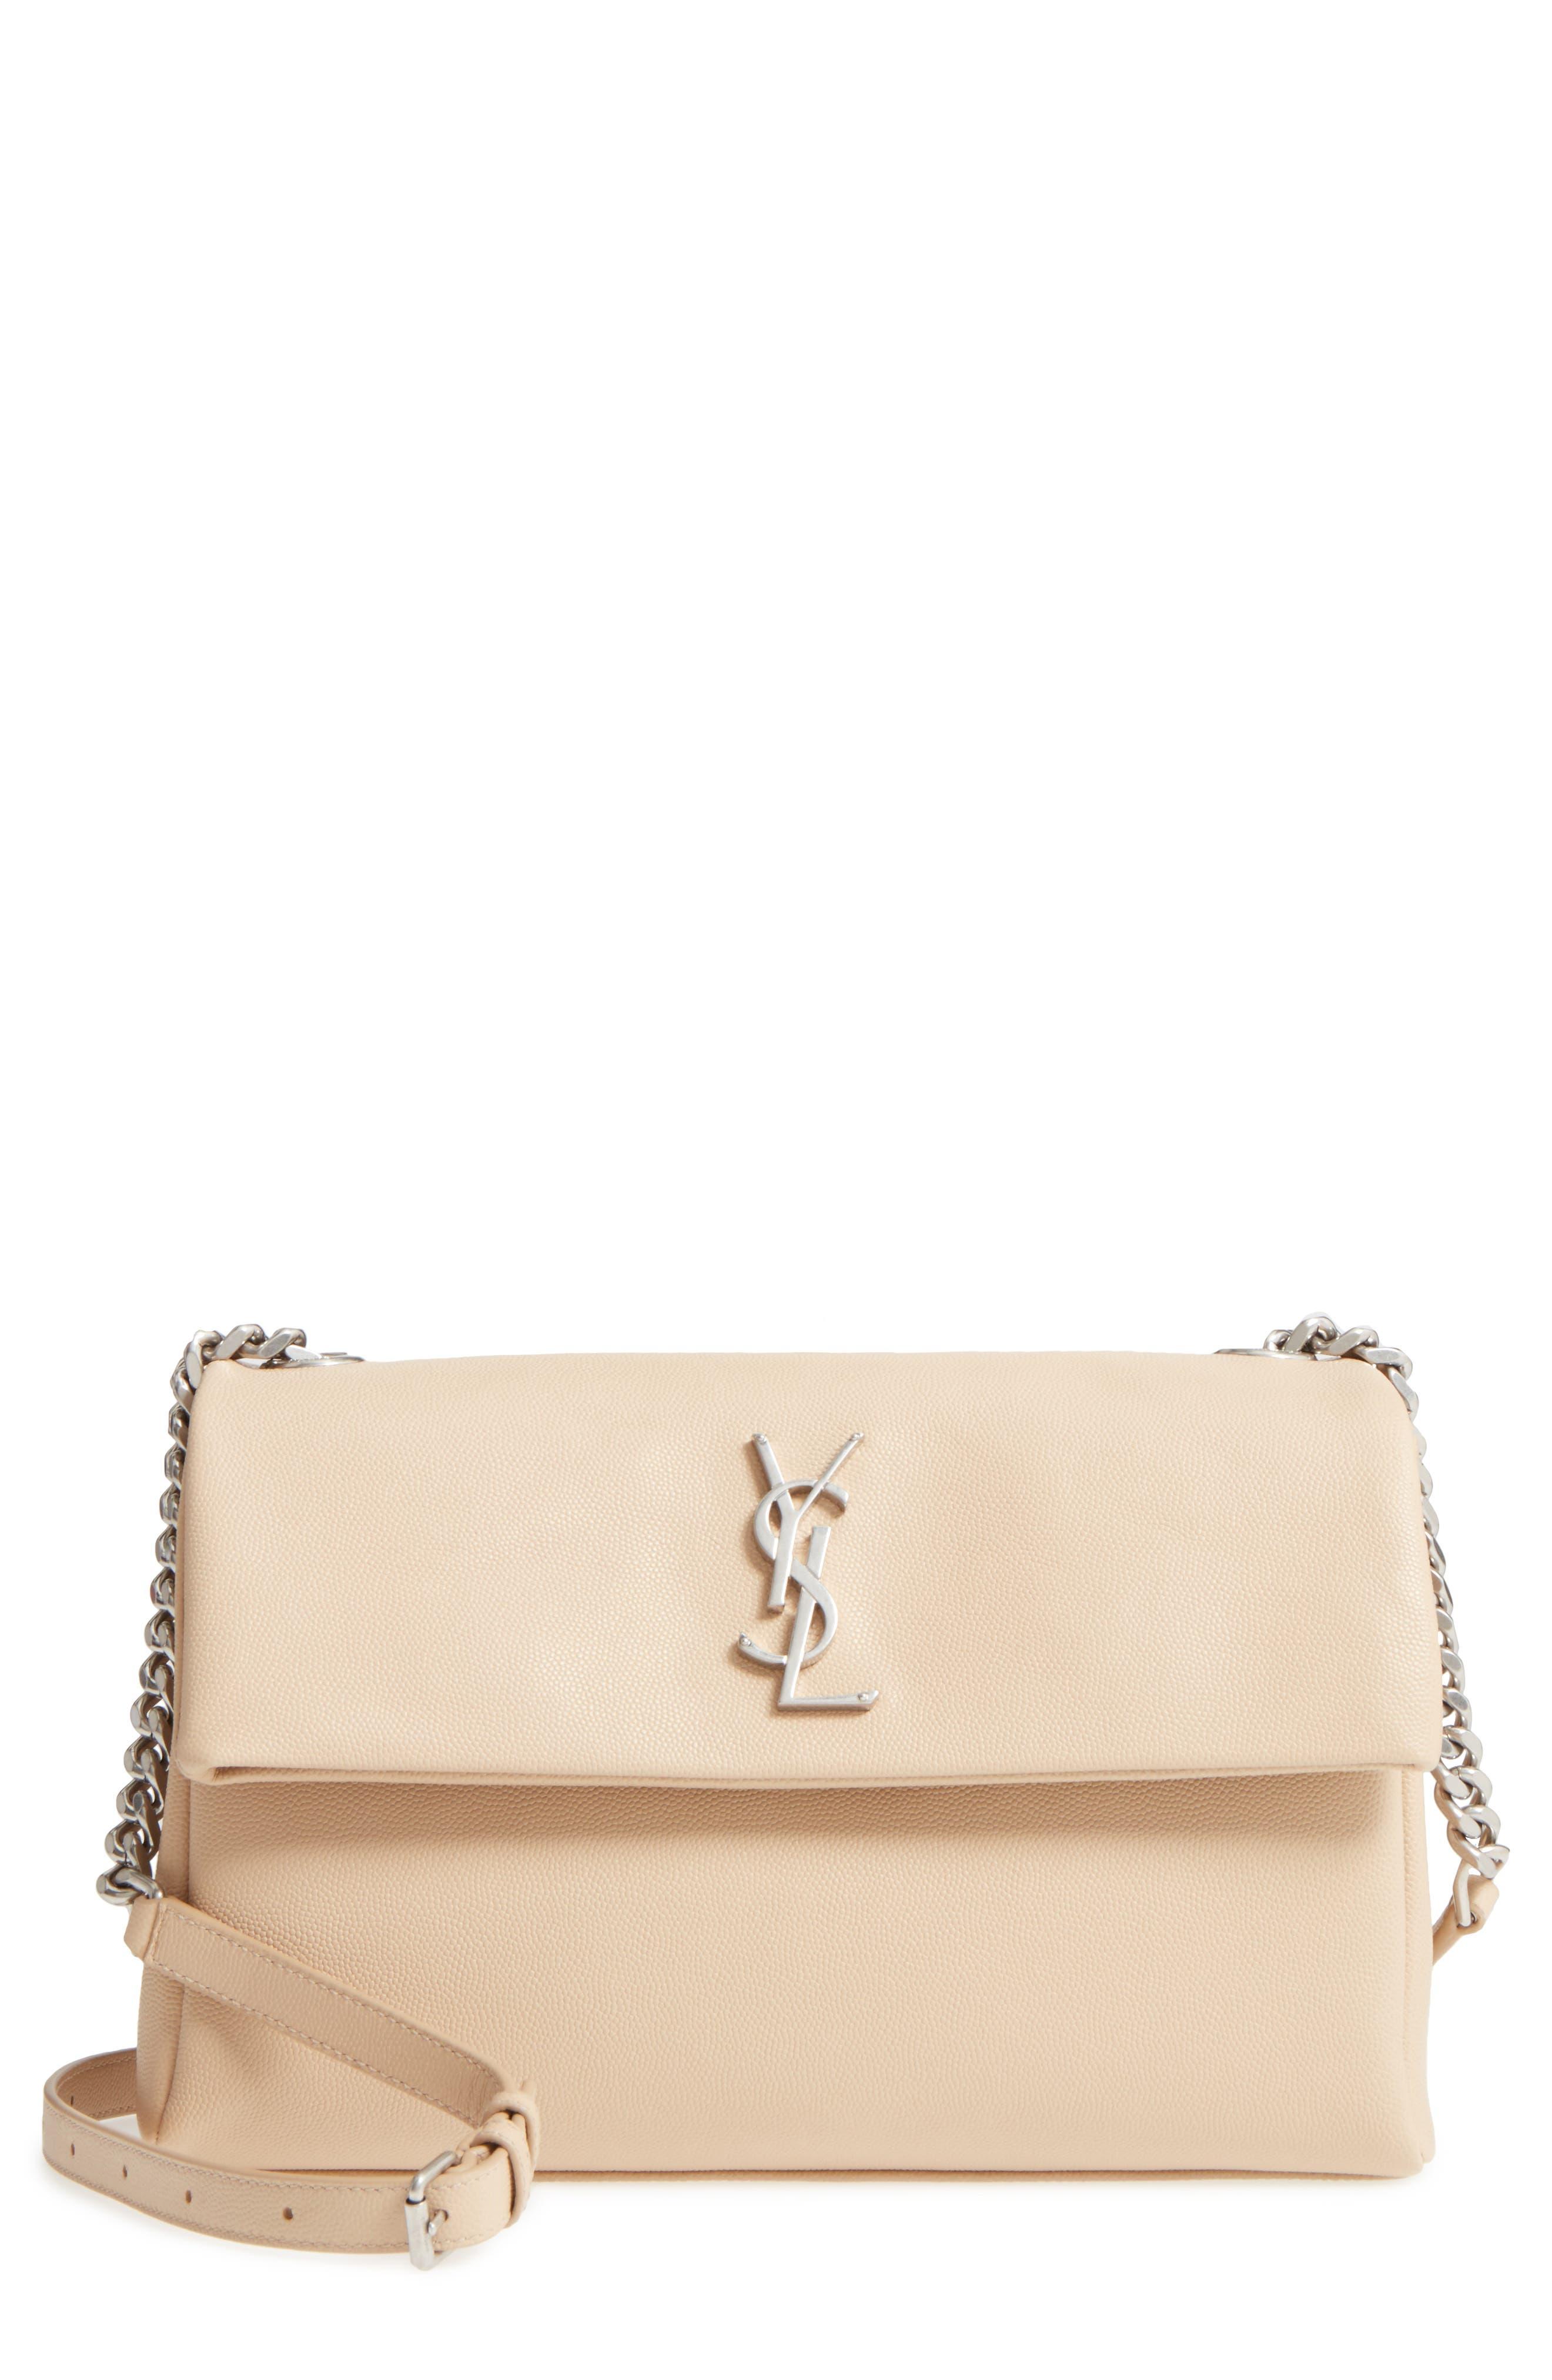 Medium West Hollywood Leather Shoulder Bag,                             Main thumbnail 3, color,